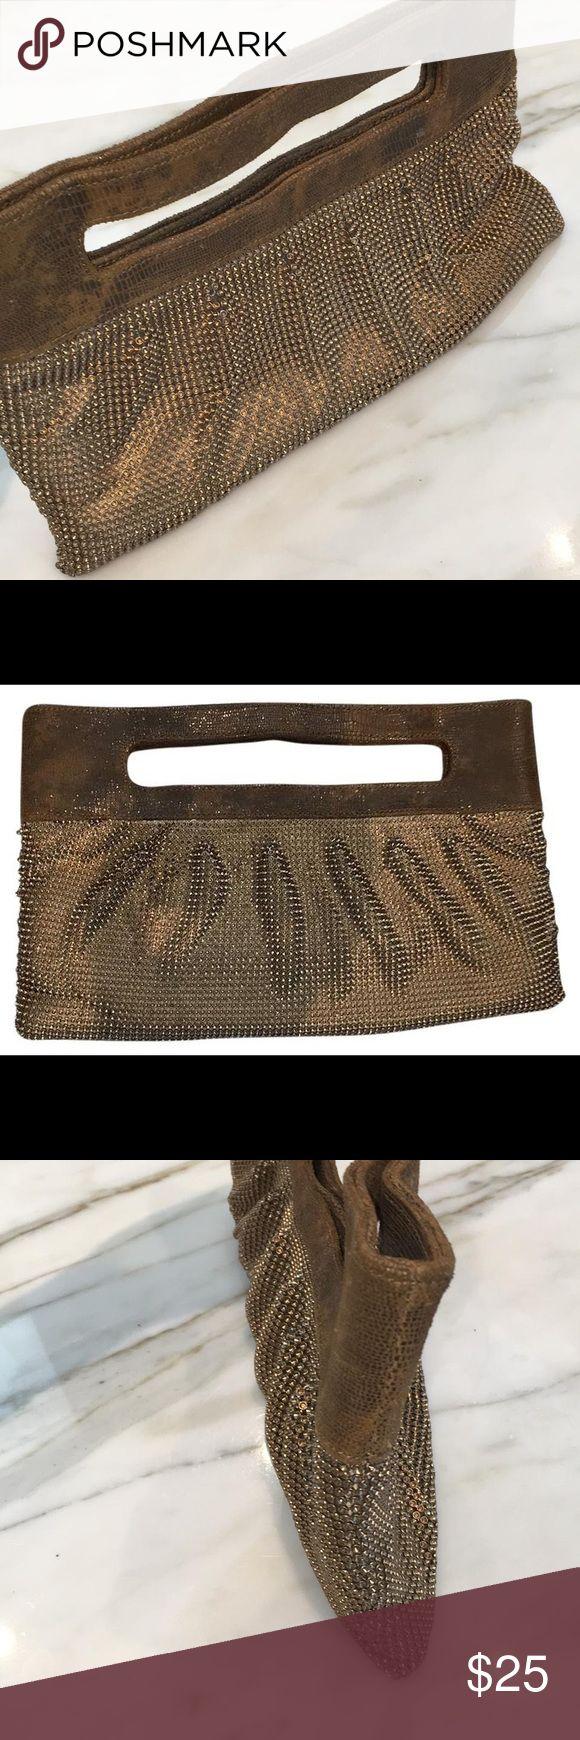 Metallic Clutch Gold metallic clutch BCBGMaxAzria Bags Clutches & Wristlets